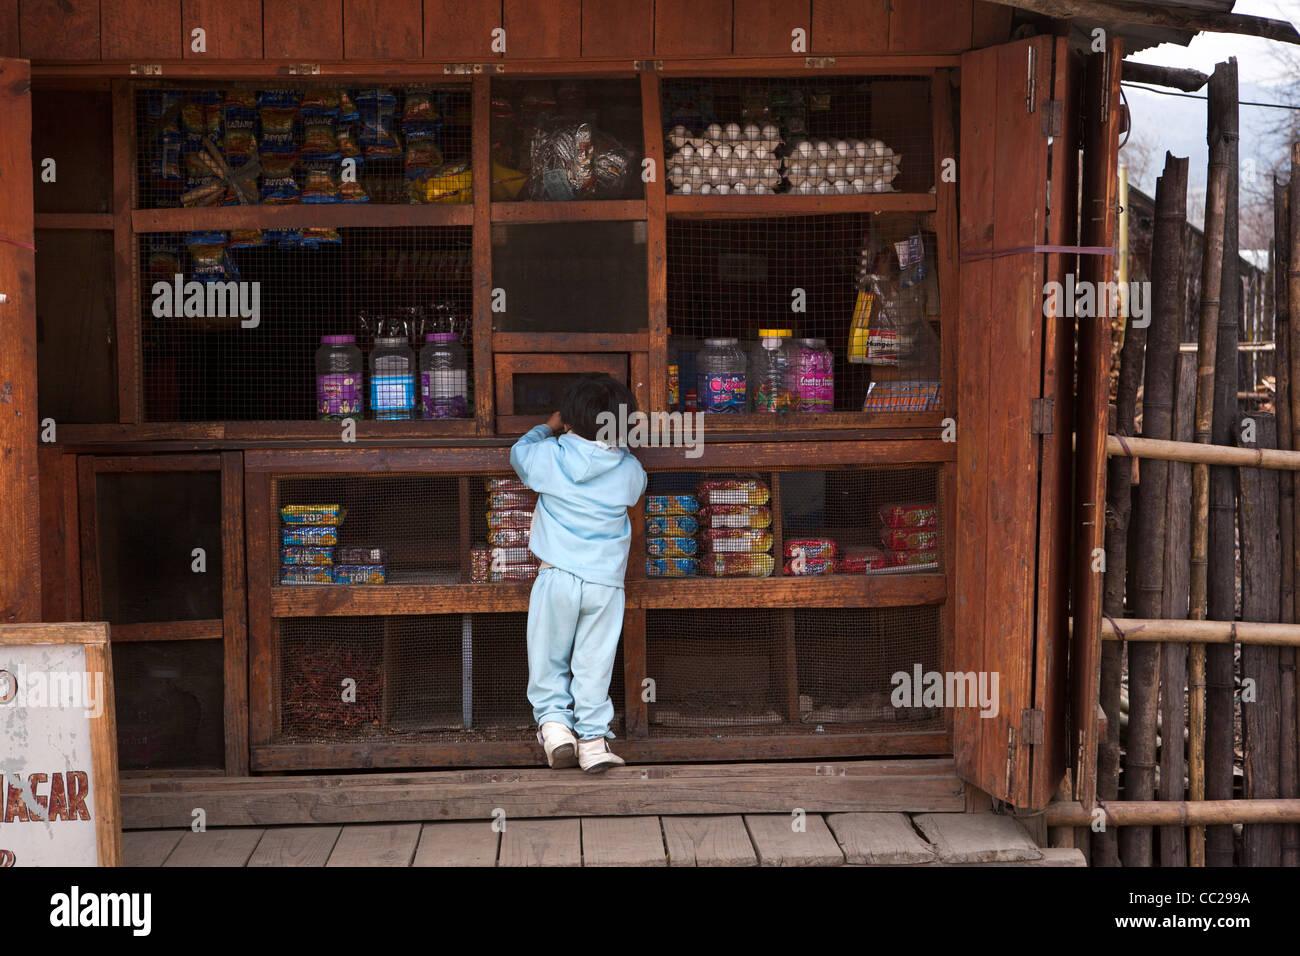 India, Arunachal Pradesh, Ziro town, child at poorly stocked local shop - Stock Image